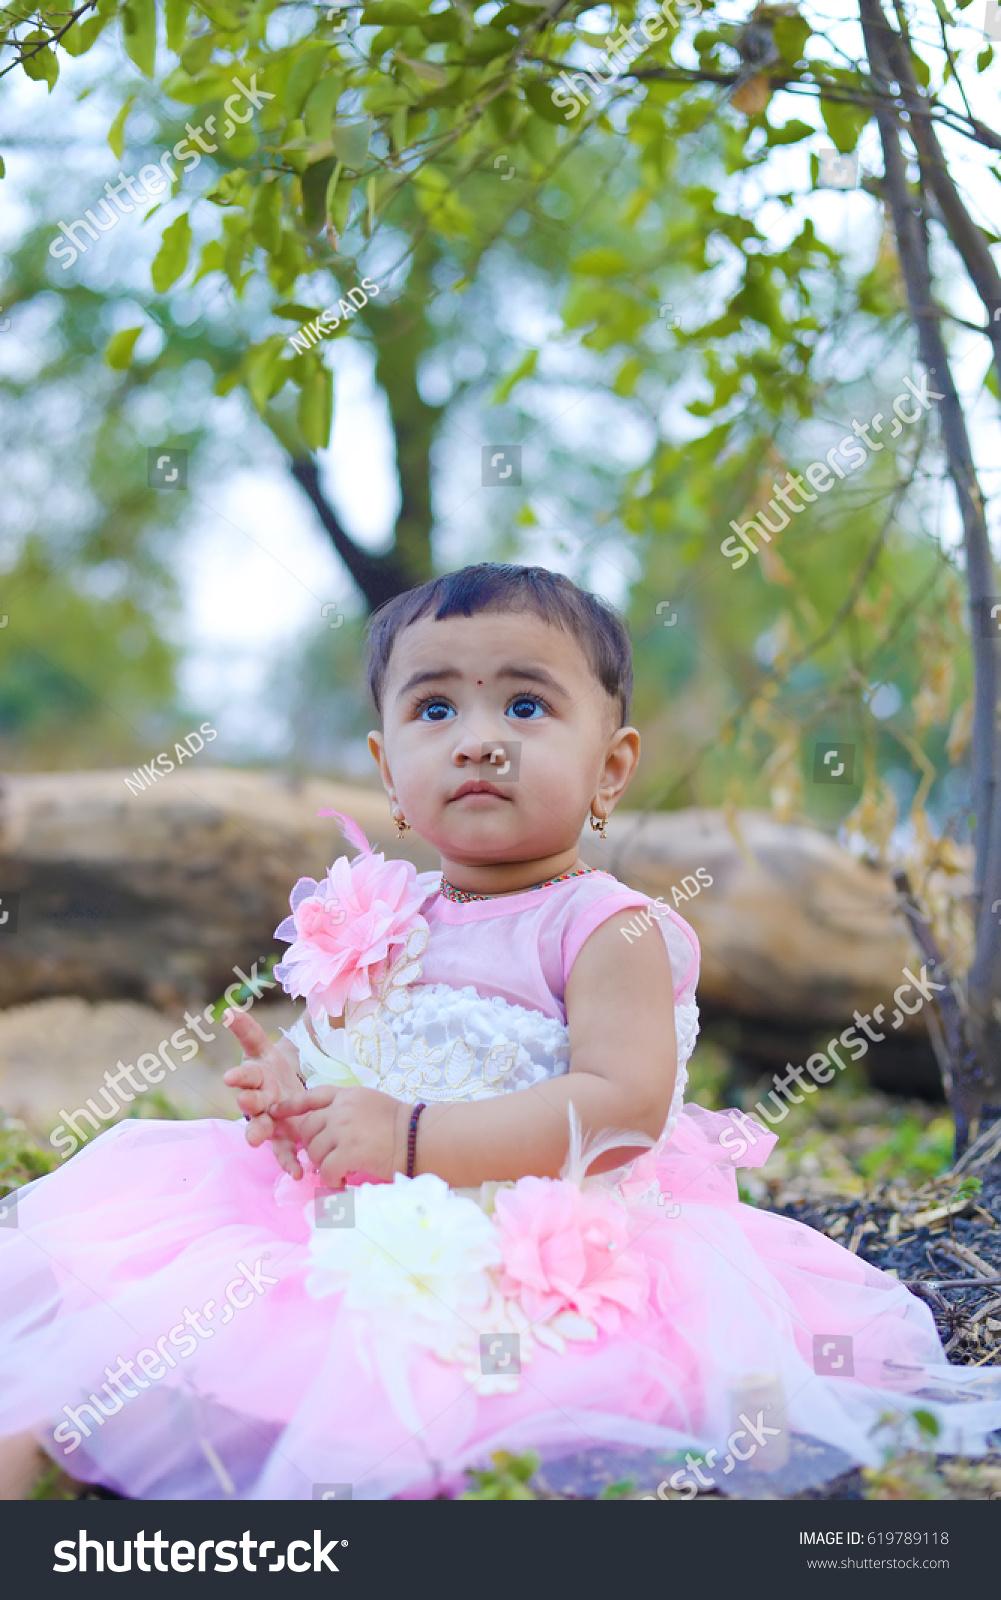 royalty-free cute indian baby girl #619789118 stock photo | avopix